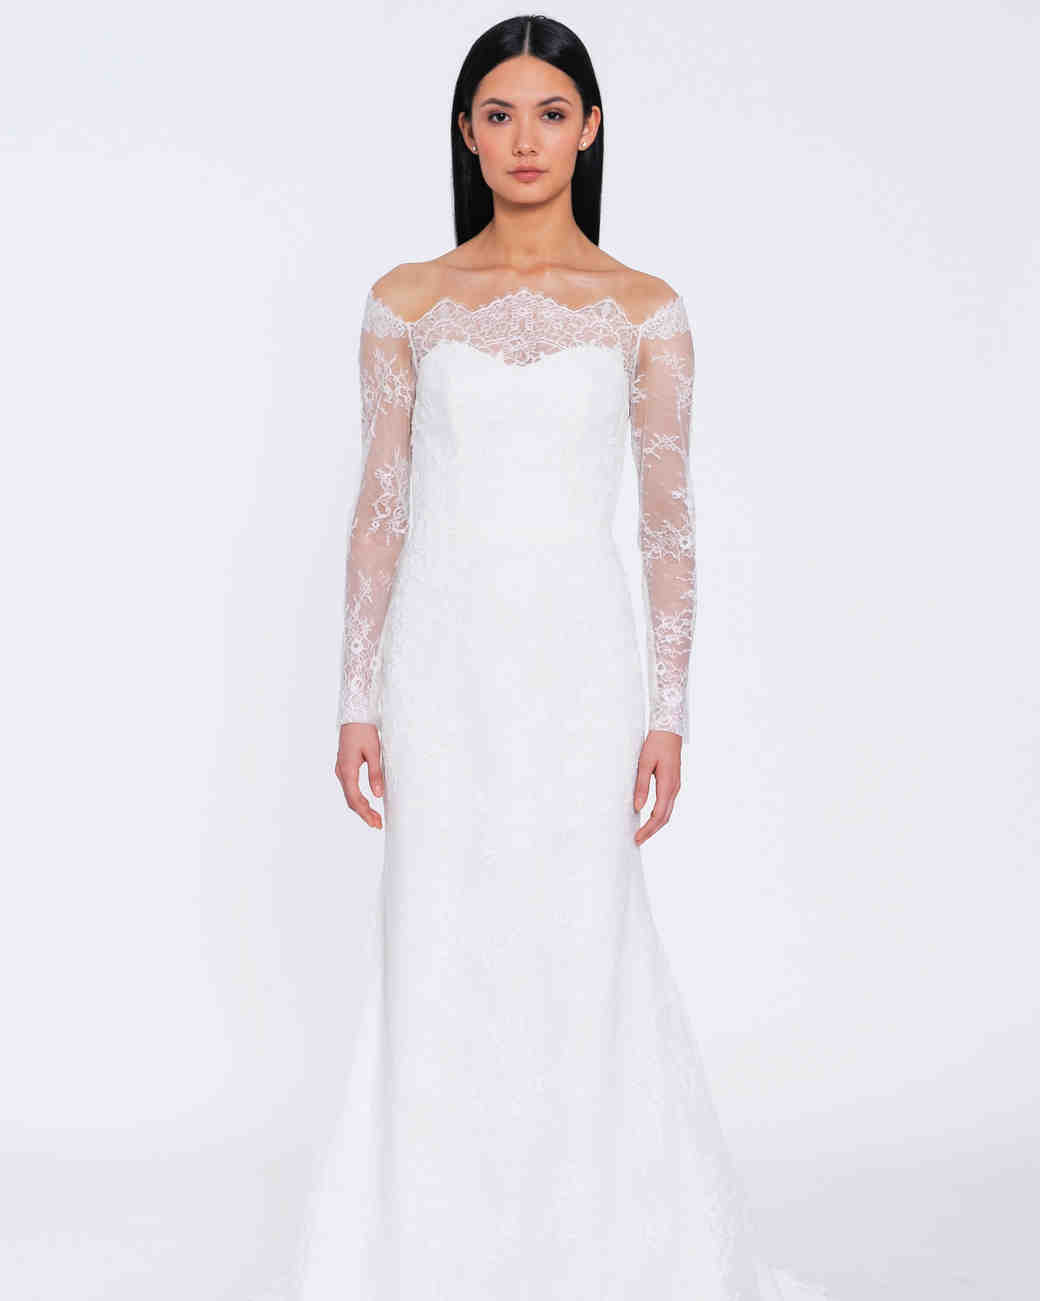 Long-Sleeved Wedding Dresses We Love   Martha Stewart Weddings